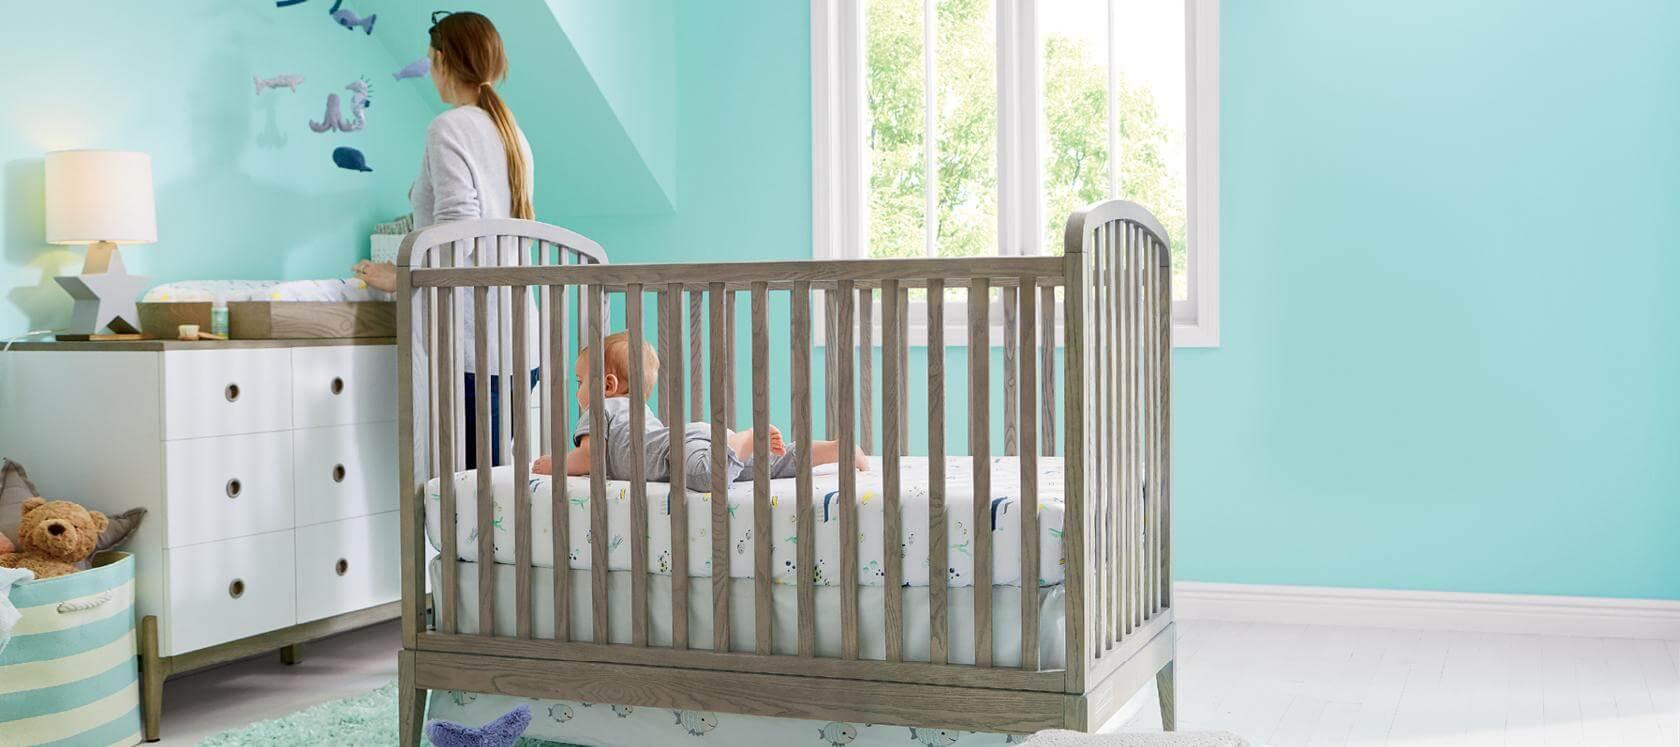 Extra Firm Mini//Portable Crib Mattress Dream On Me 3 in White